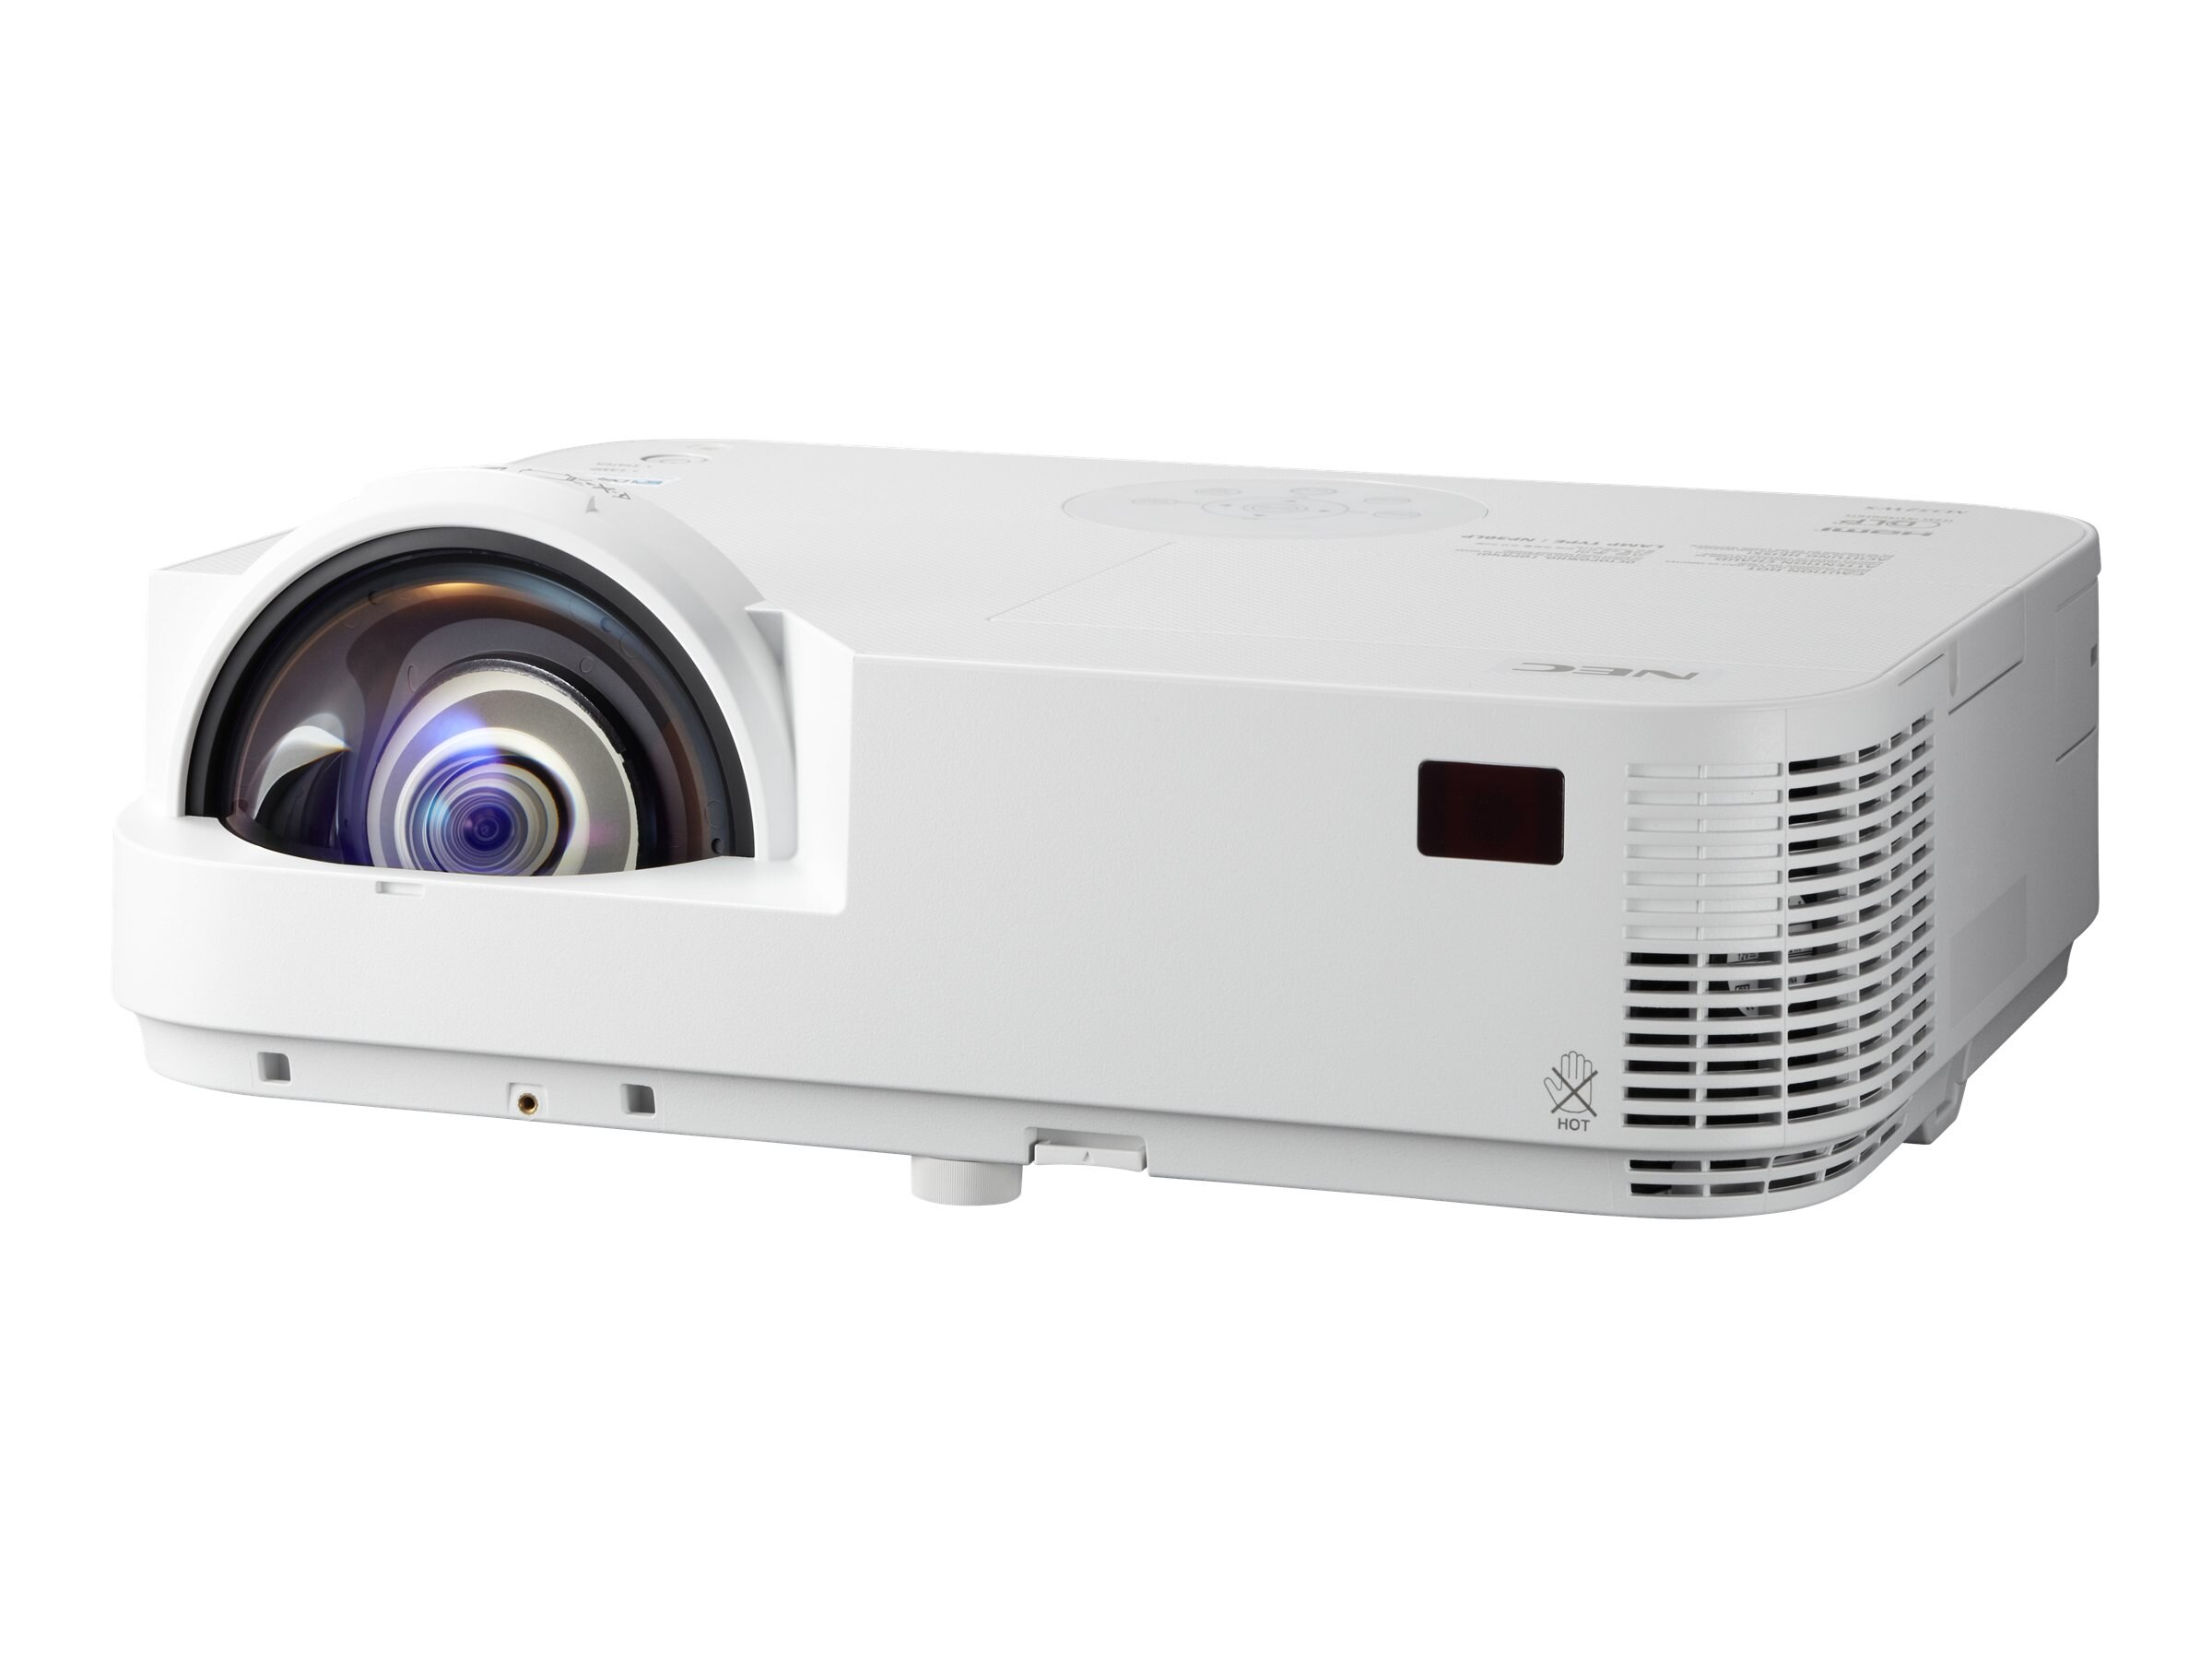 NEC NP-M332XS Image 1